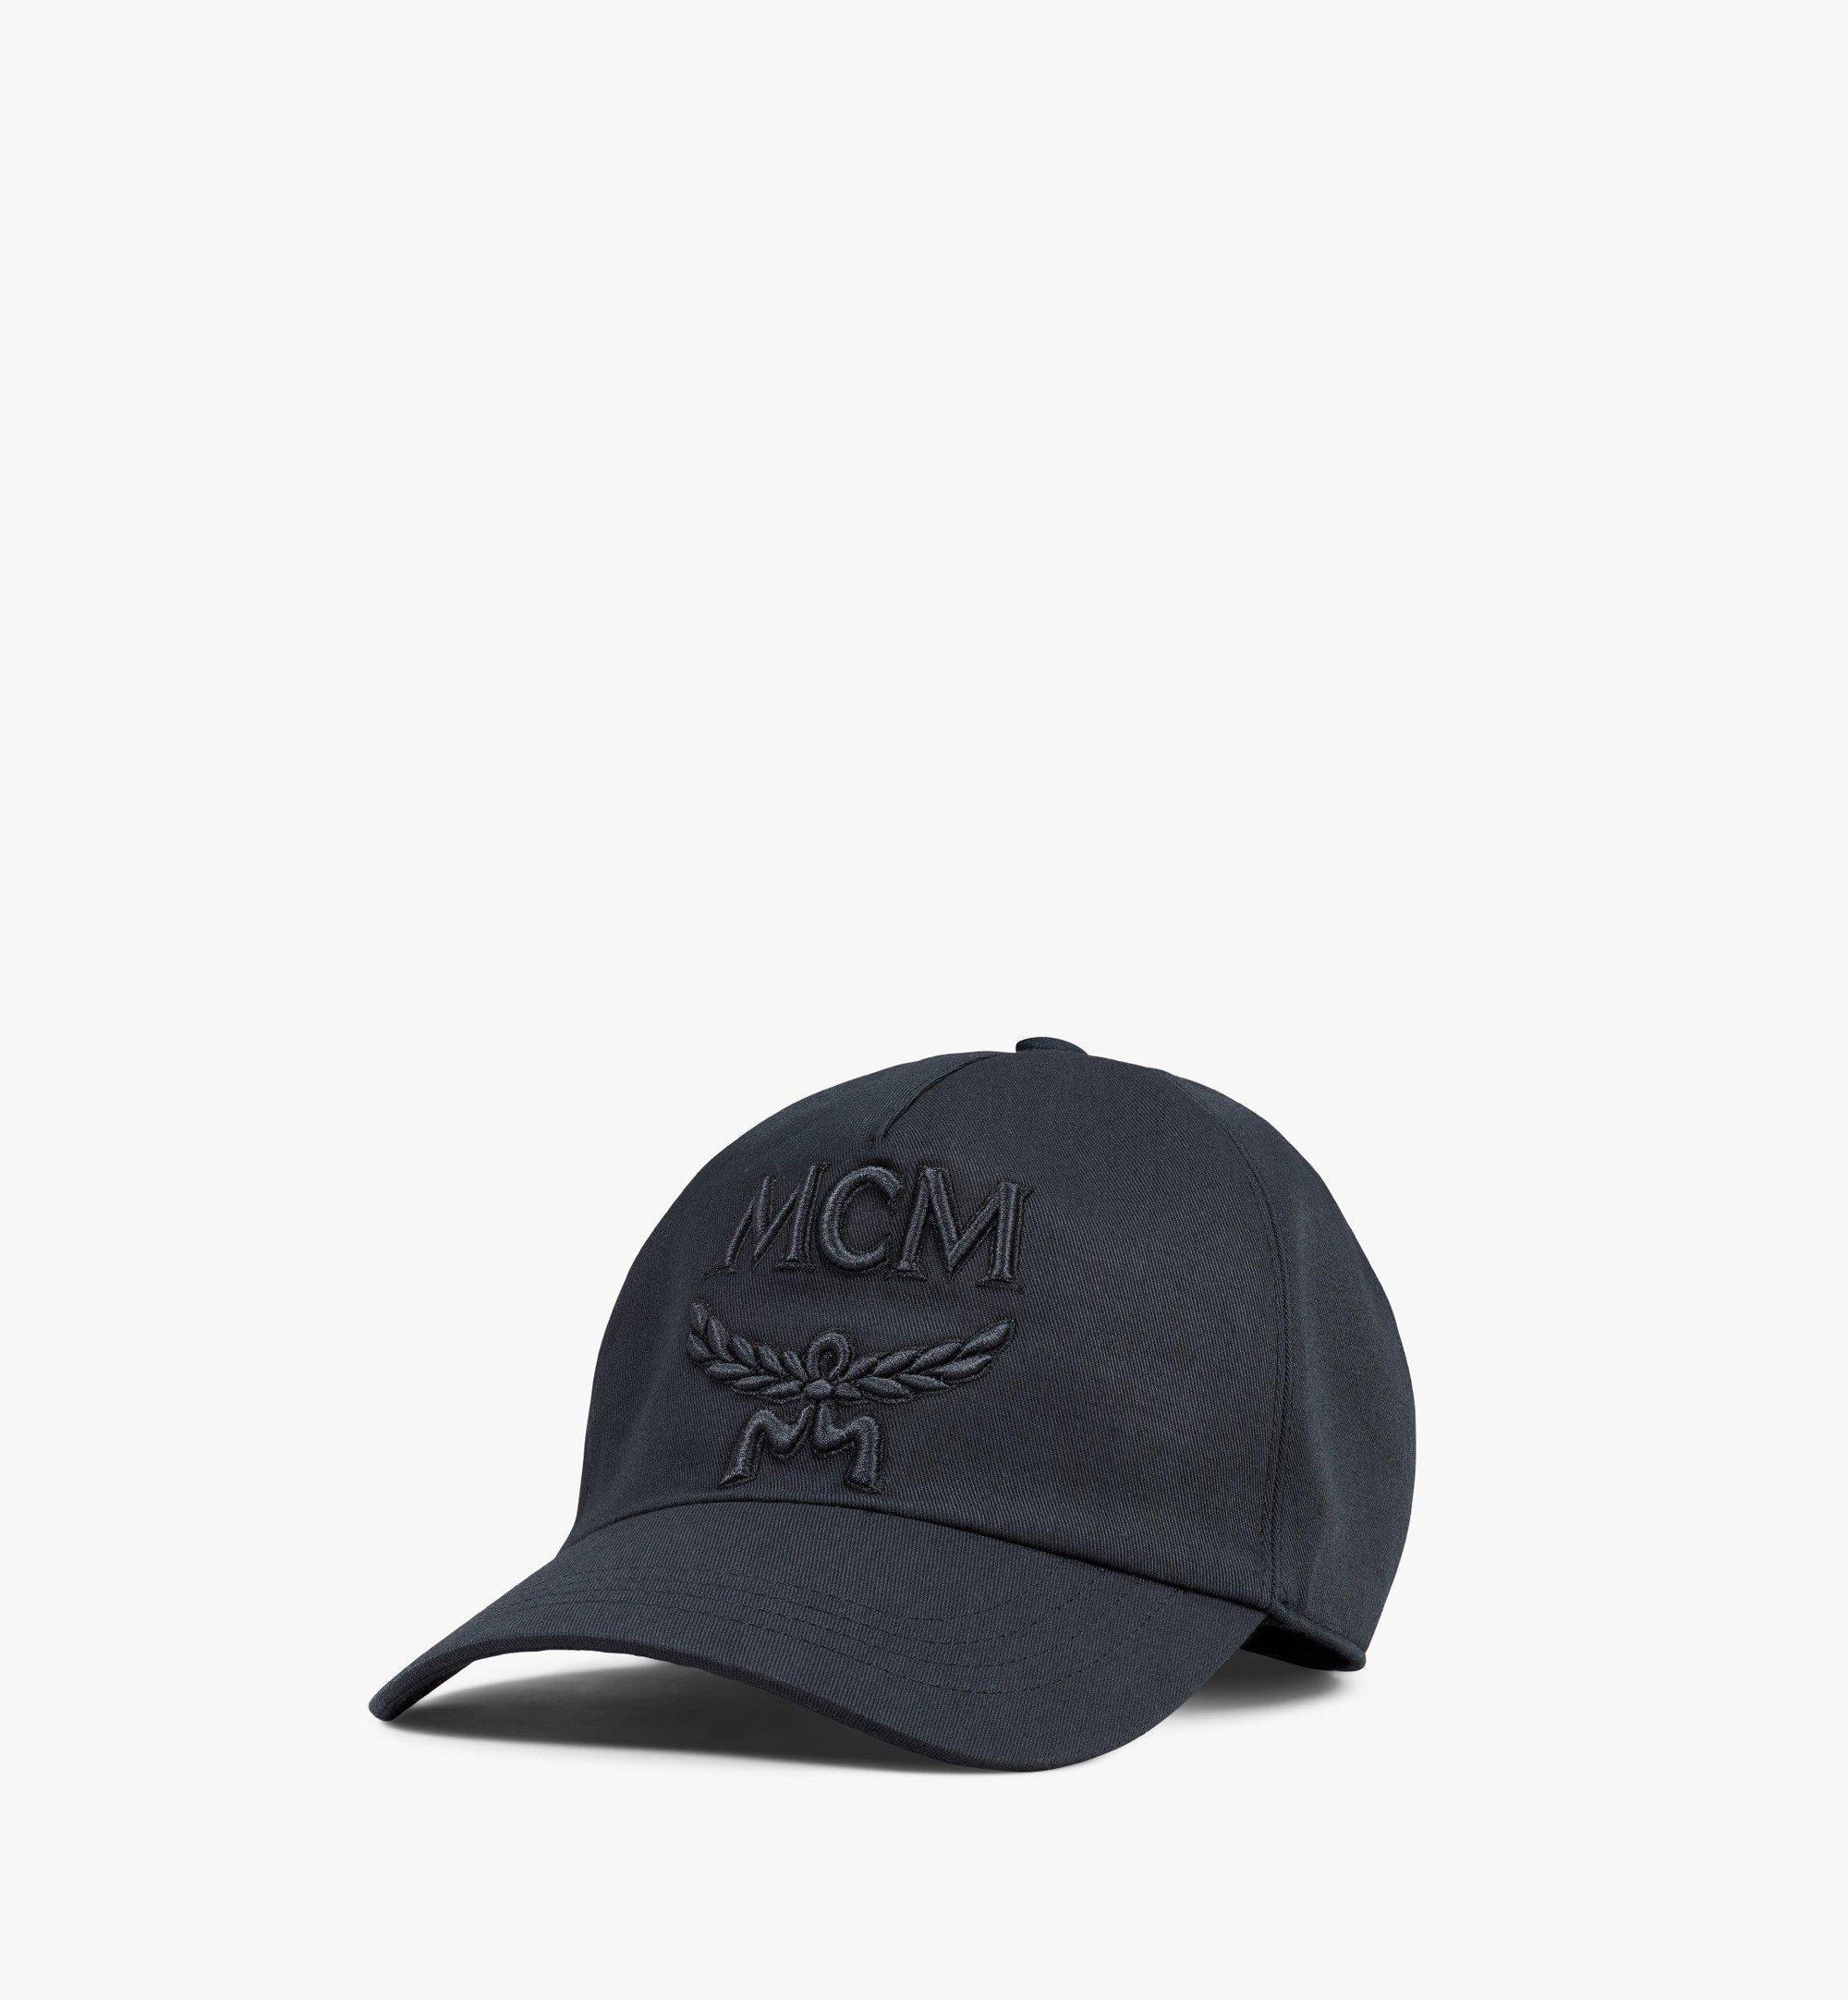 MCM Classic Logo Cap  - BLACK - Size: FFF